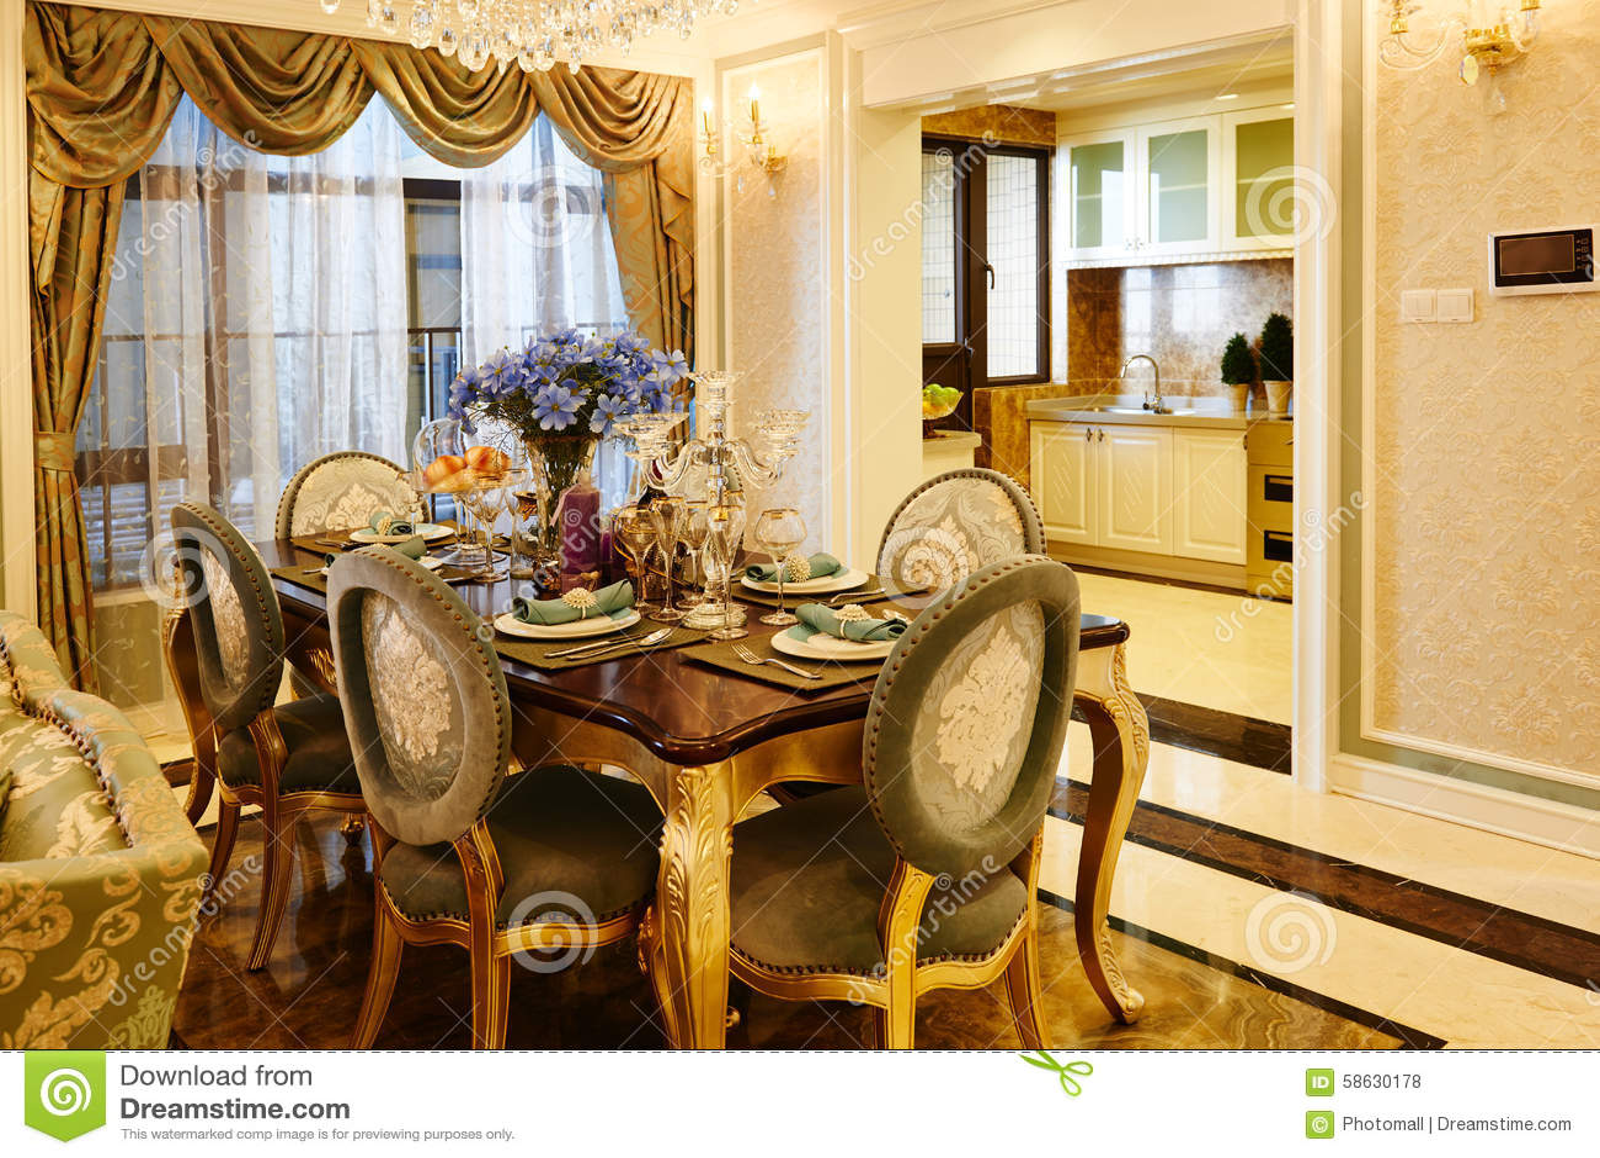 Cucina E Sala Da Pranzo Di Lusso Fotografia Stock Editoriale ...